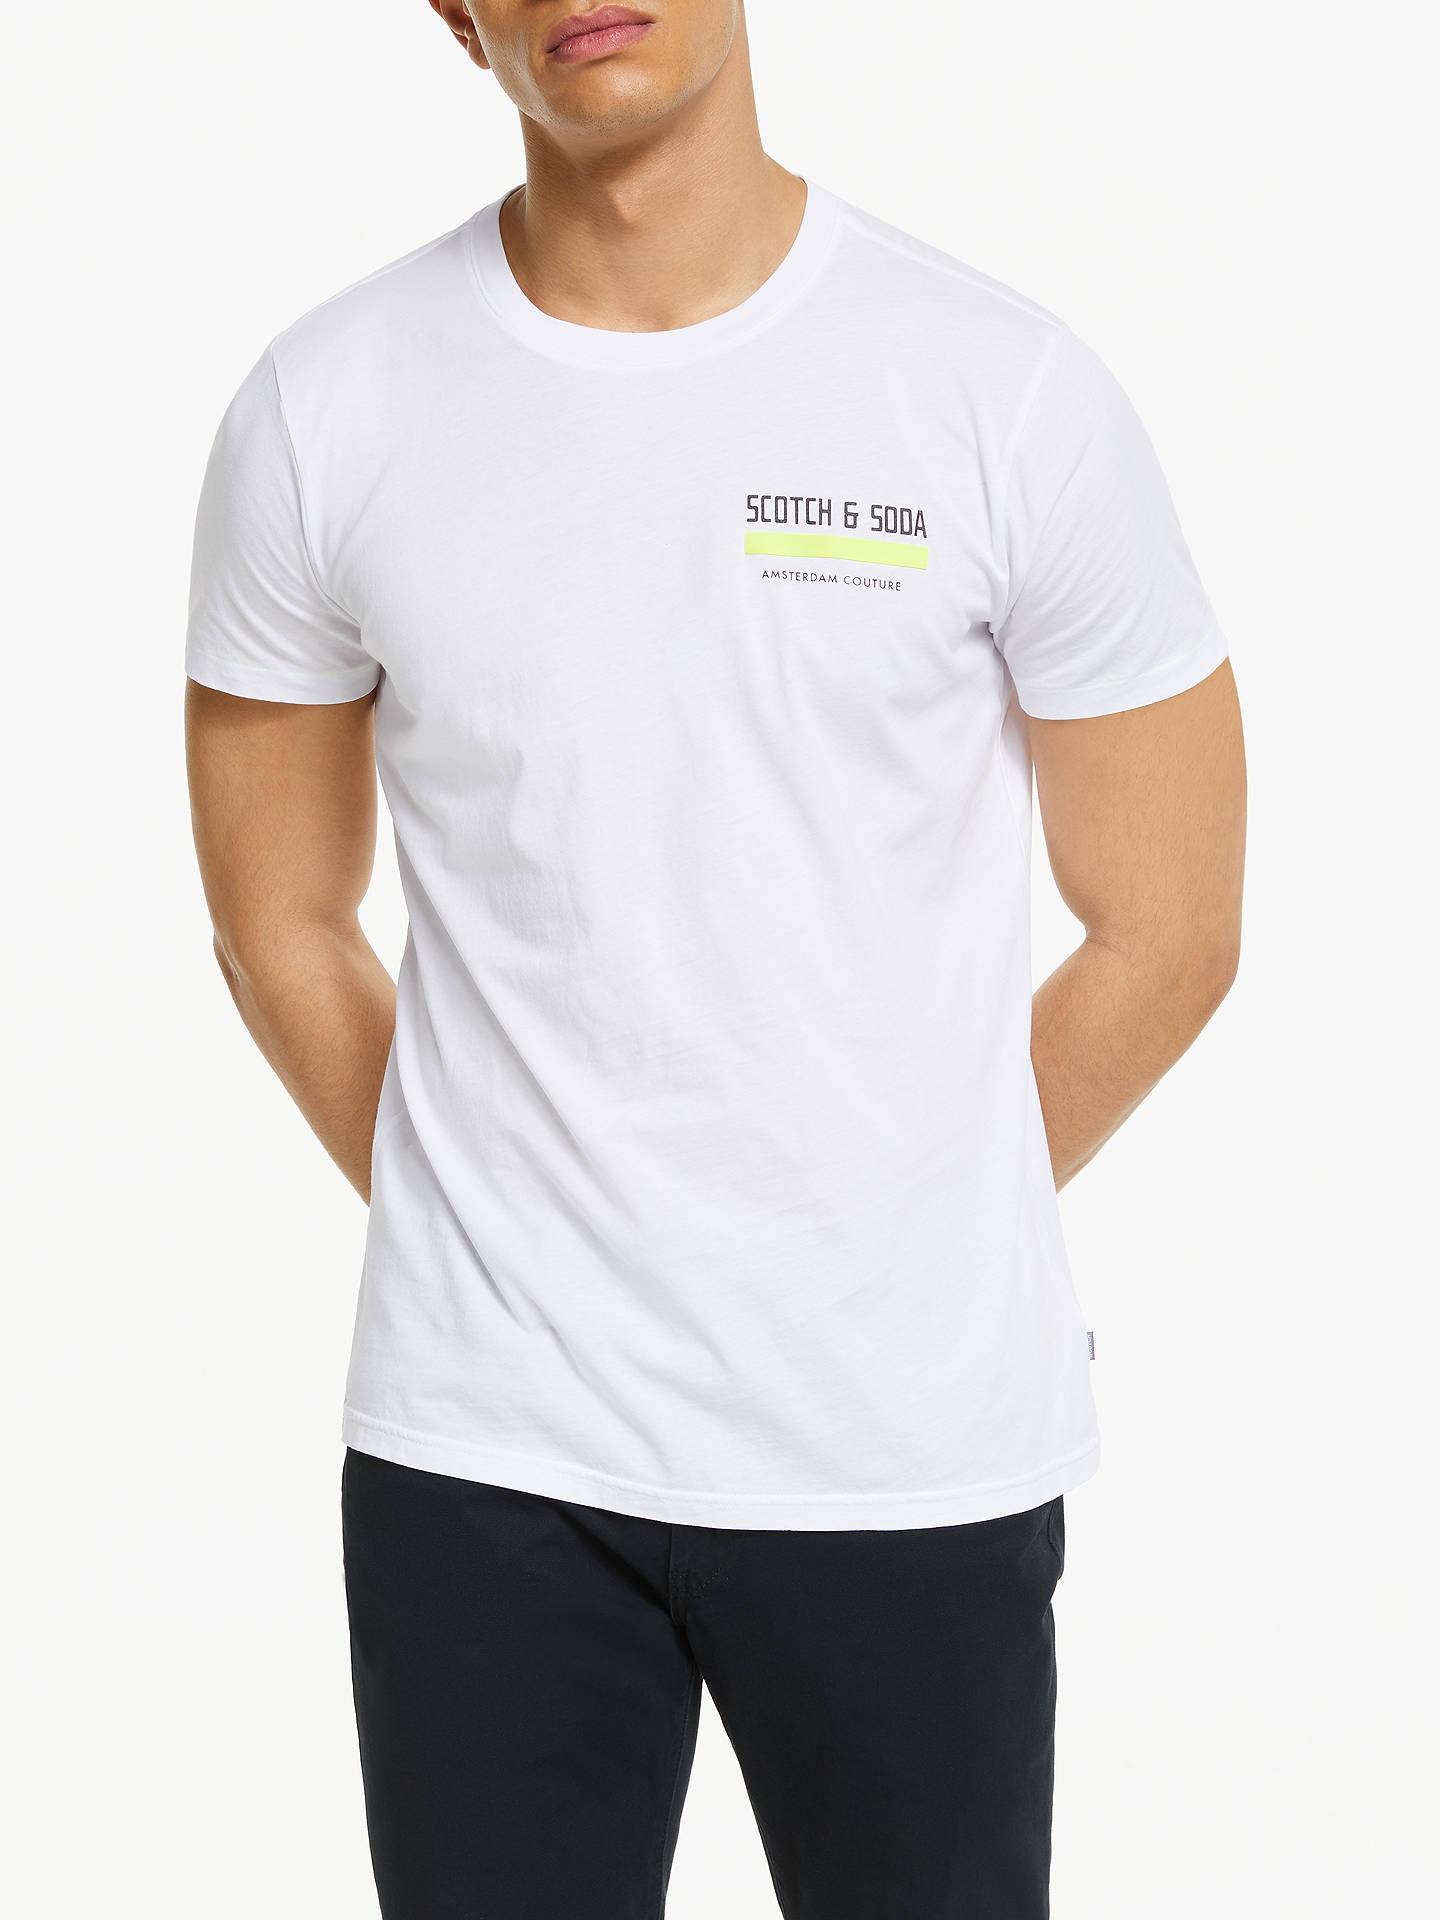 7dcc1e57a9e00a Scotch & Soda Crew Neck Logo T-Shirt, White at John Lewis & Partners